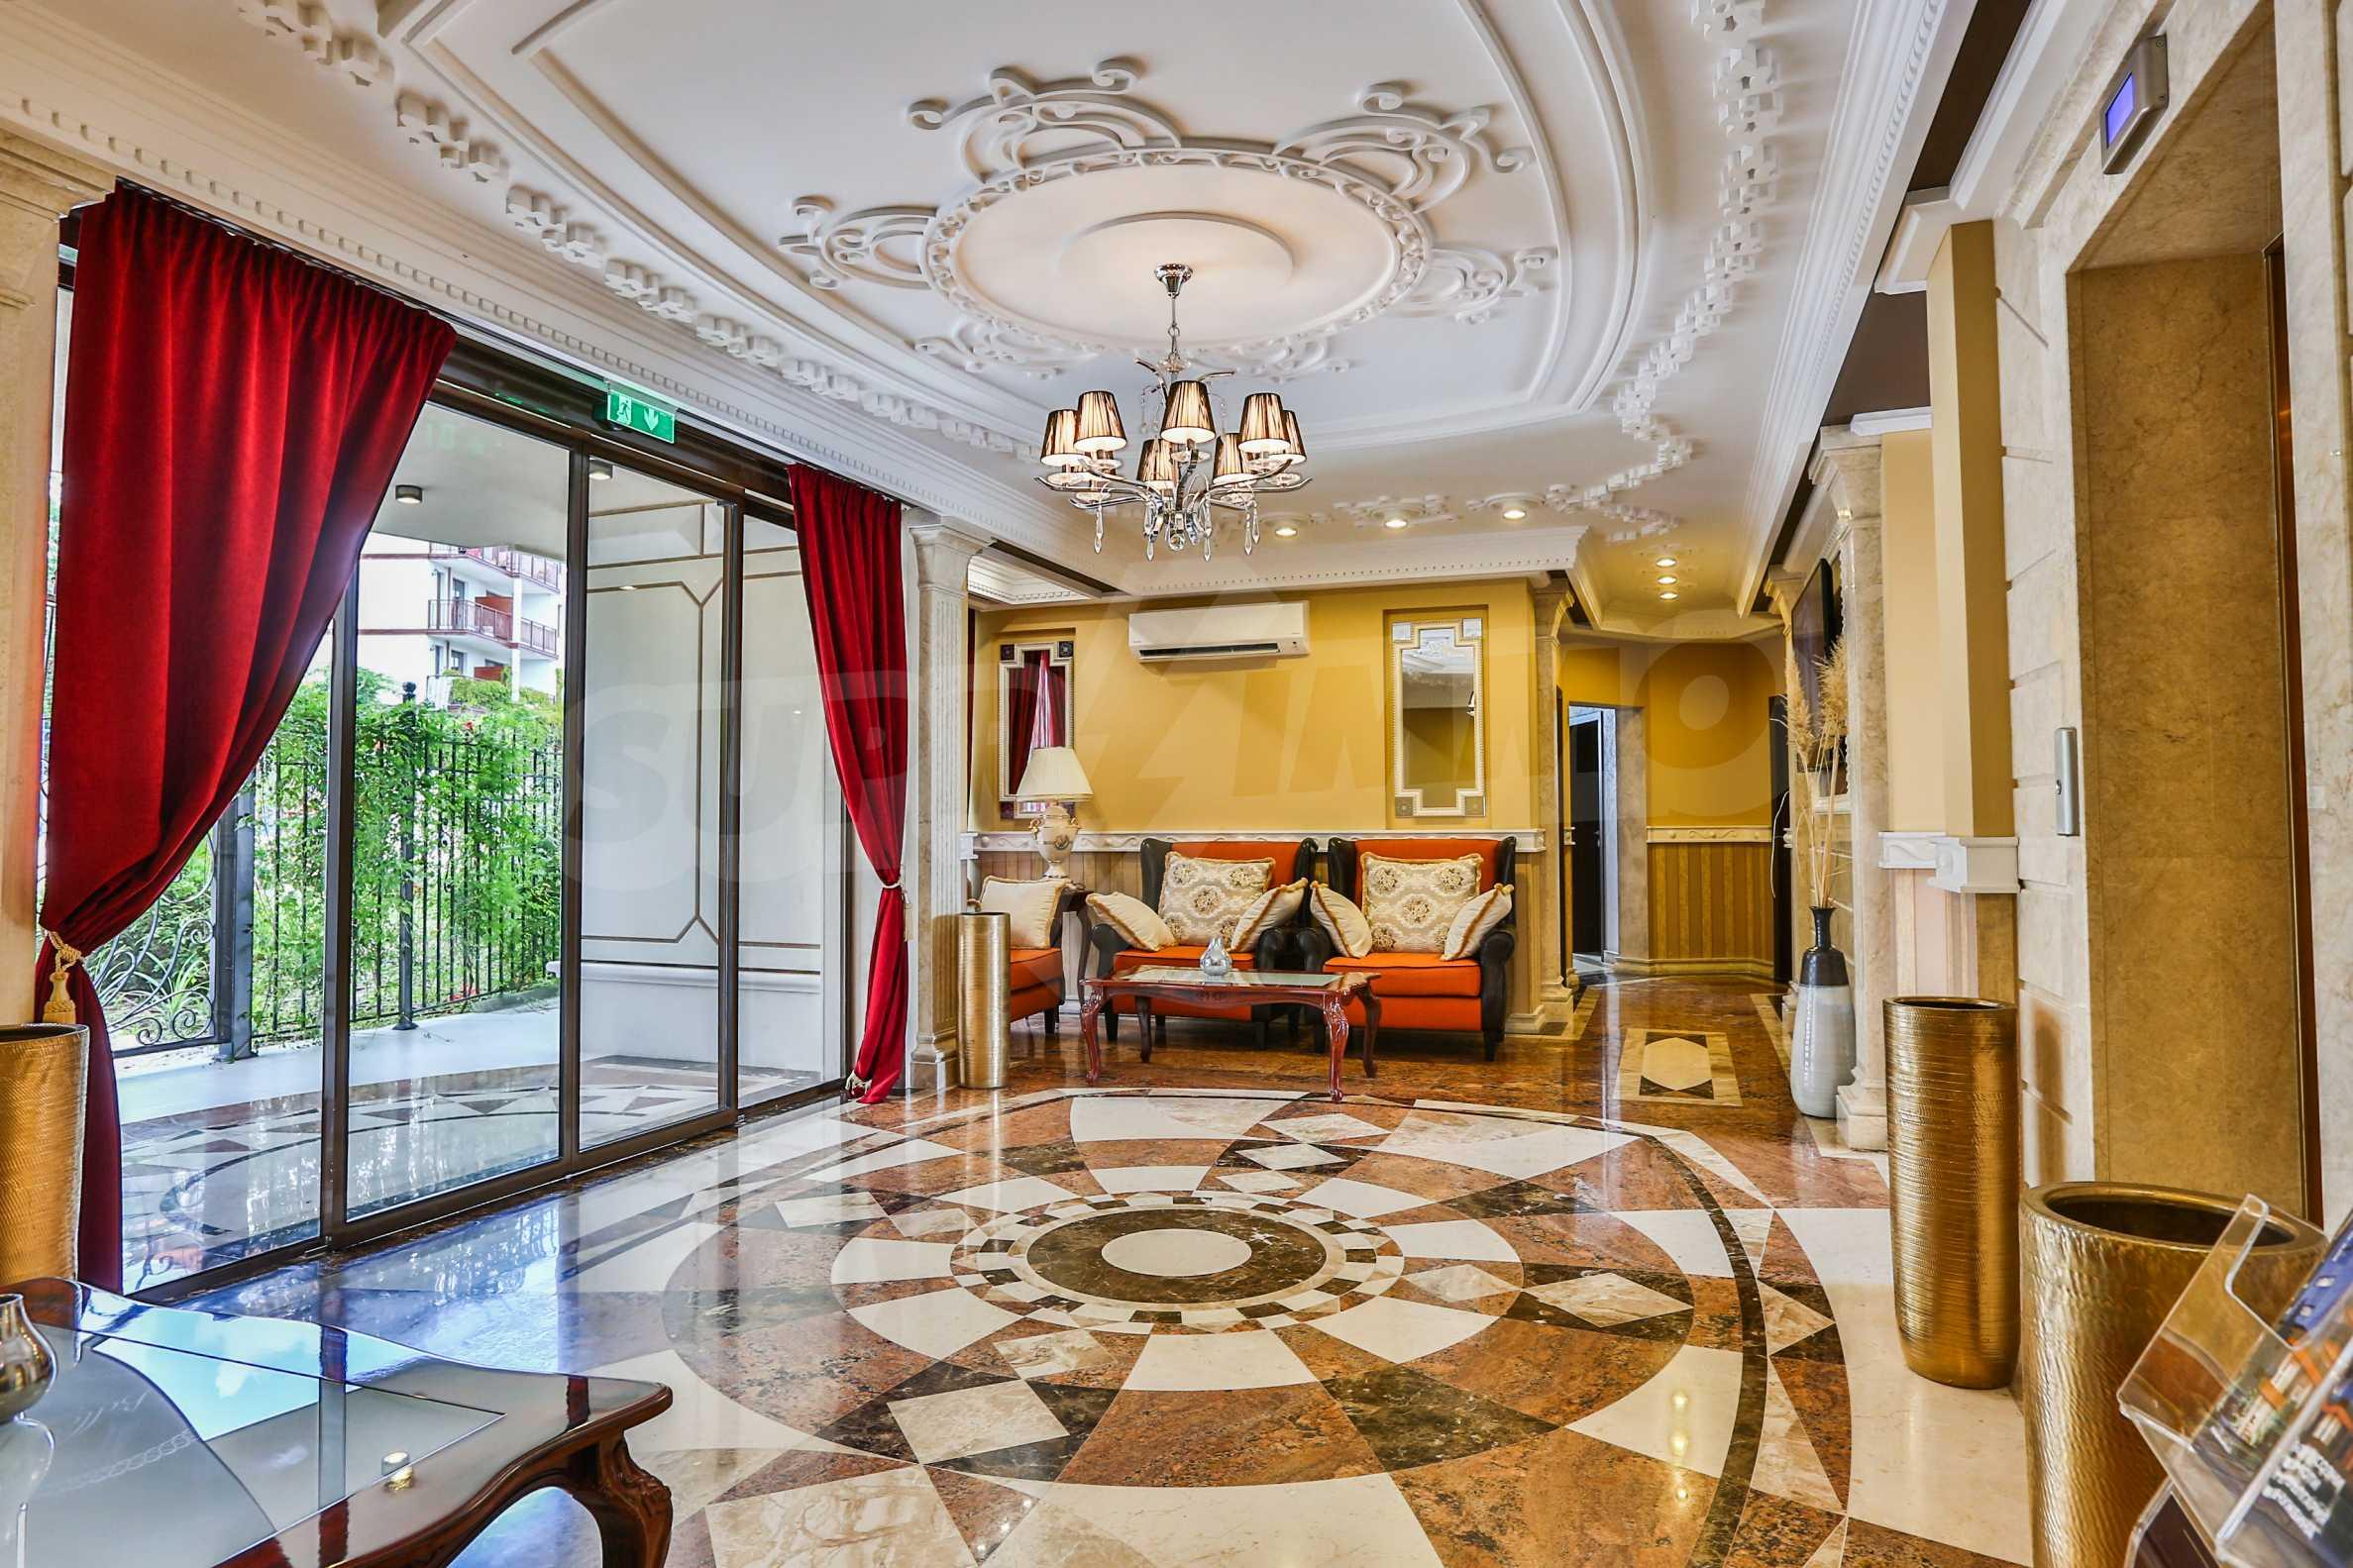 Exclusive 2-bedroom beachfront apartment in the prestigious Belle Époque Beach Residence 30